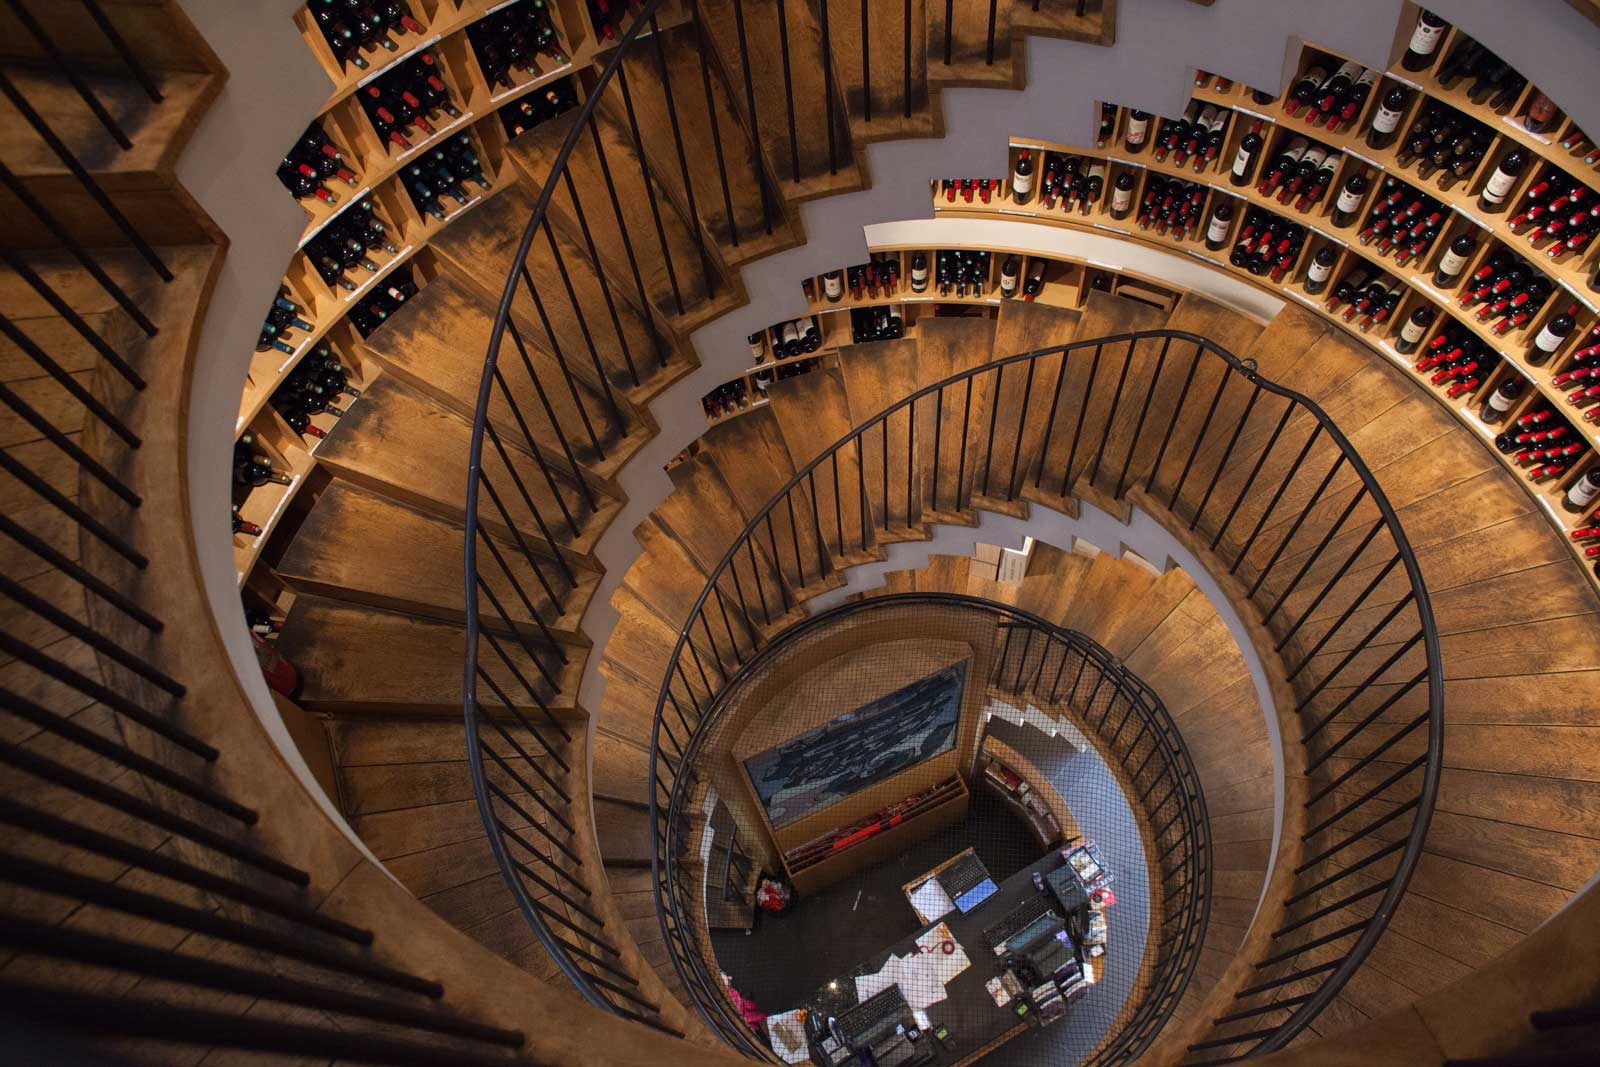 L'Intendant wine shop in Bordeaux, France. ©Kevin Day / Opening a Bottle